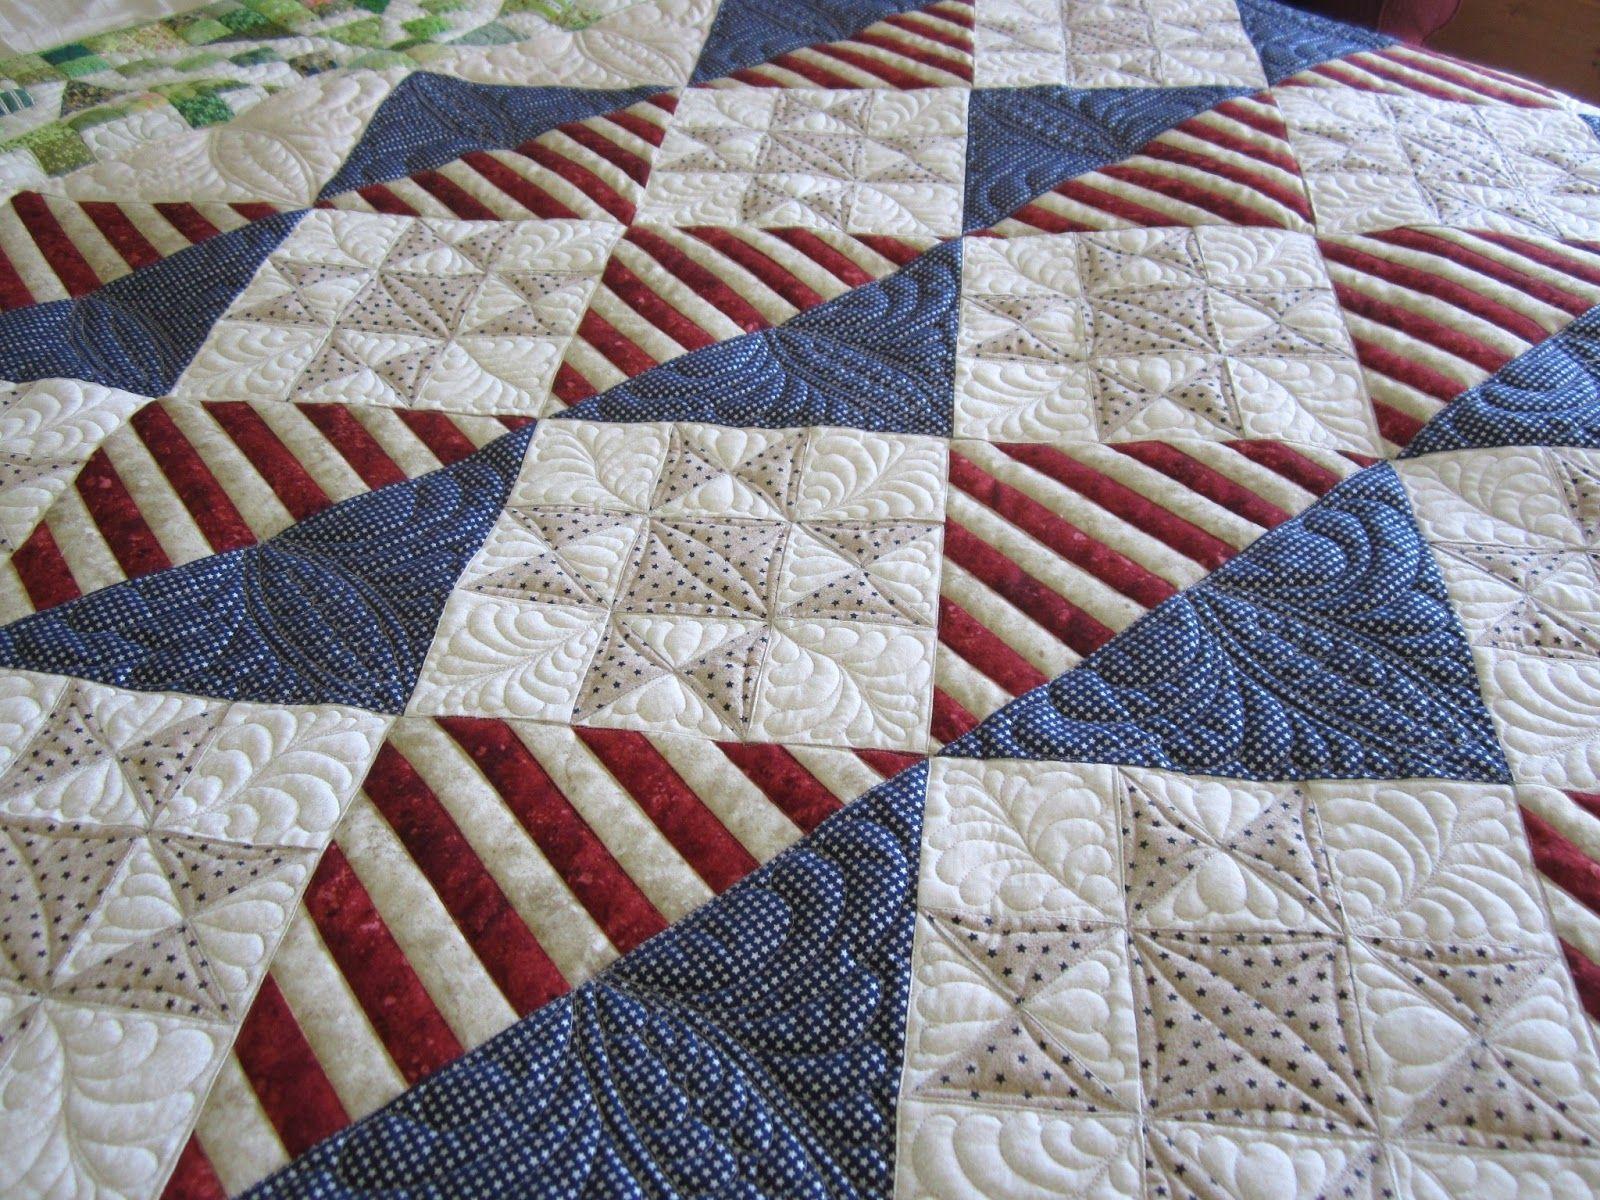 Free Big Block Quilt Patterns ... fonsandporter com articles in honor of patriotic quilt of ...